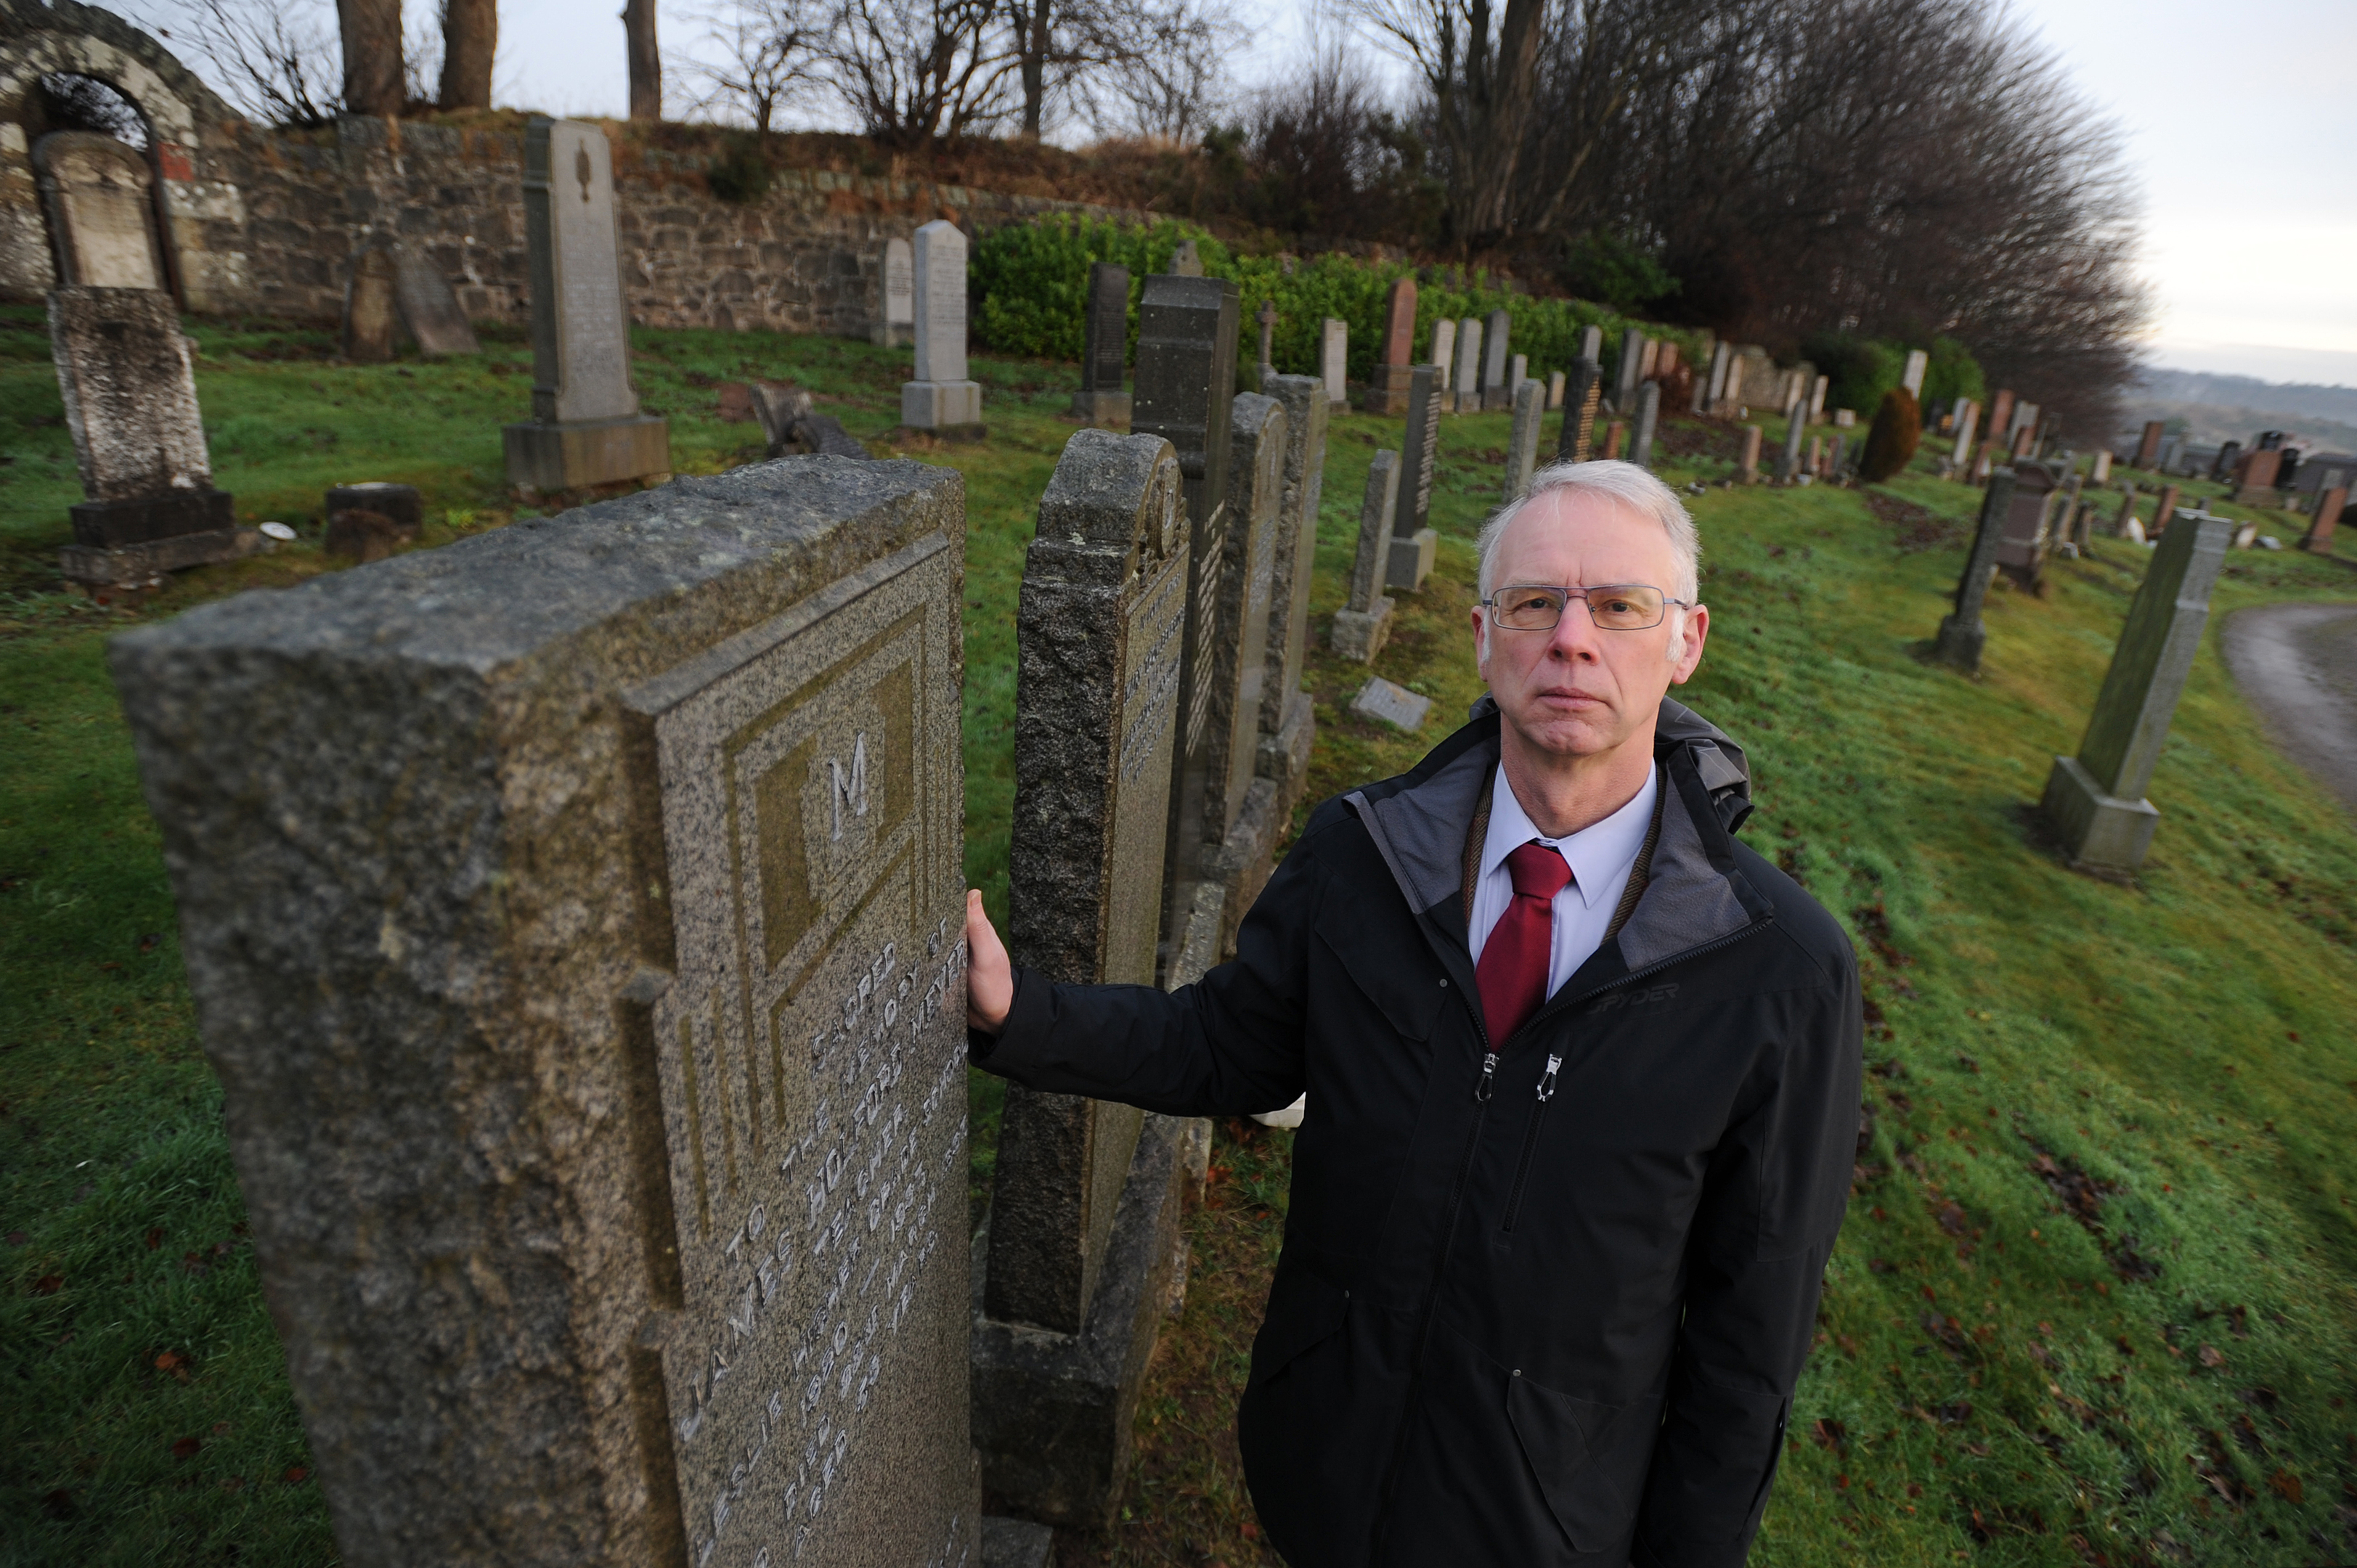 Councillor John Wincott looks around Leslie Cemetery.